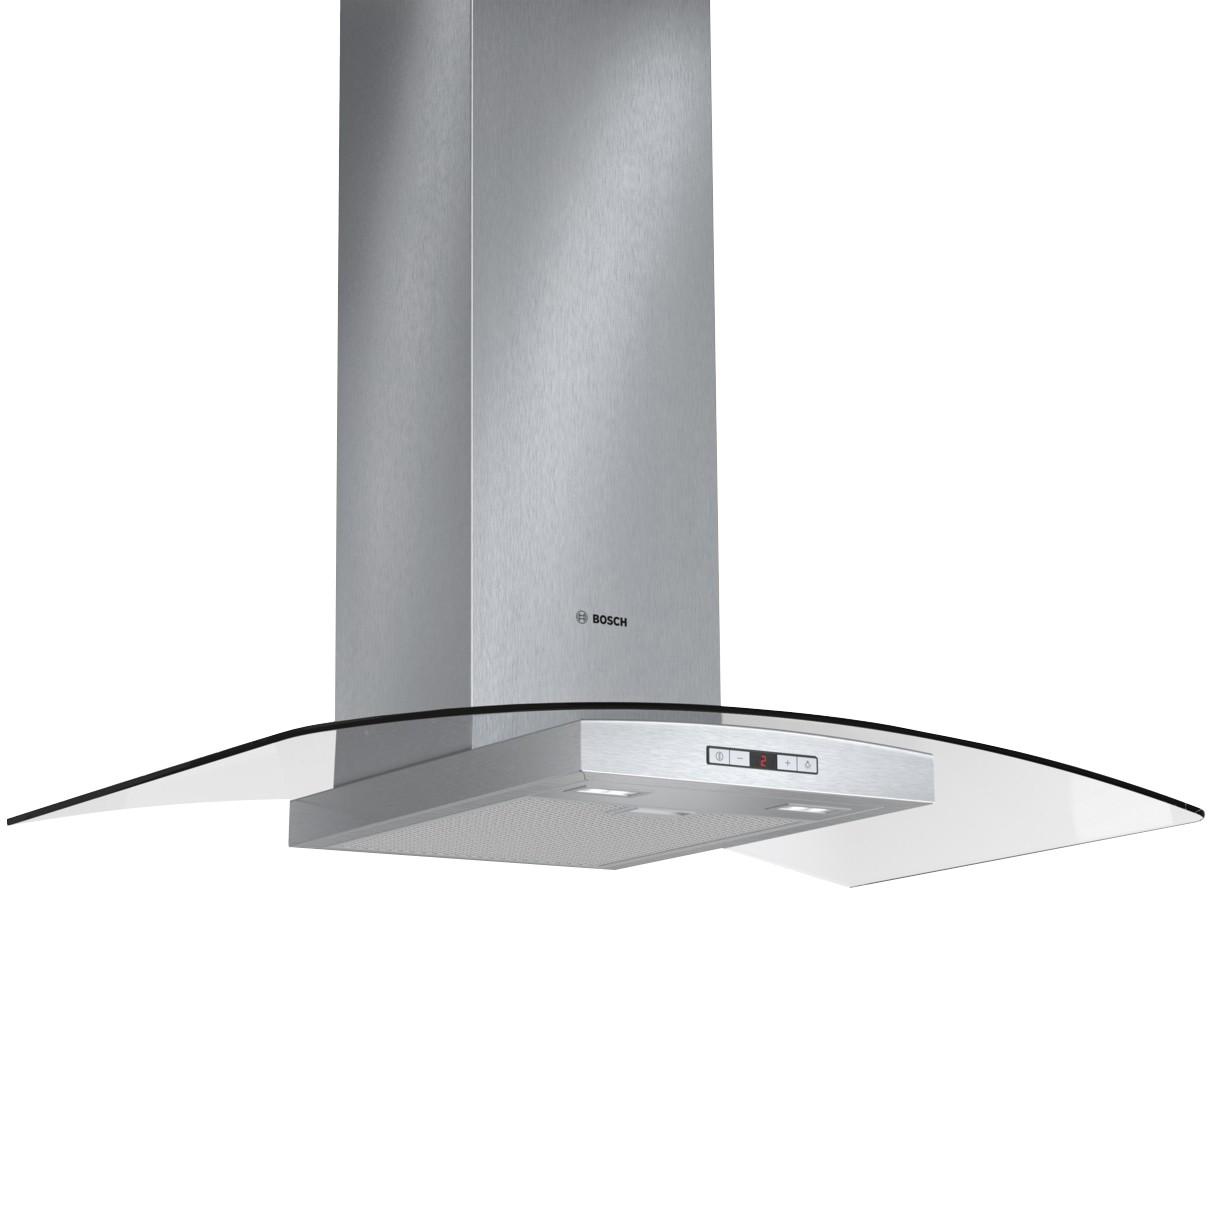 Bosch DWA097E51B Chimney Cooker Hood